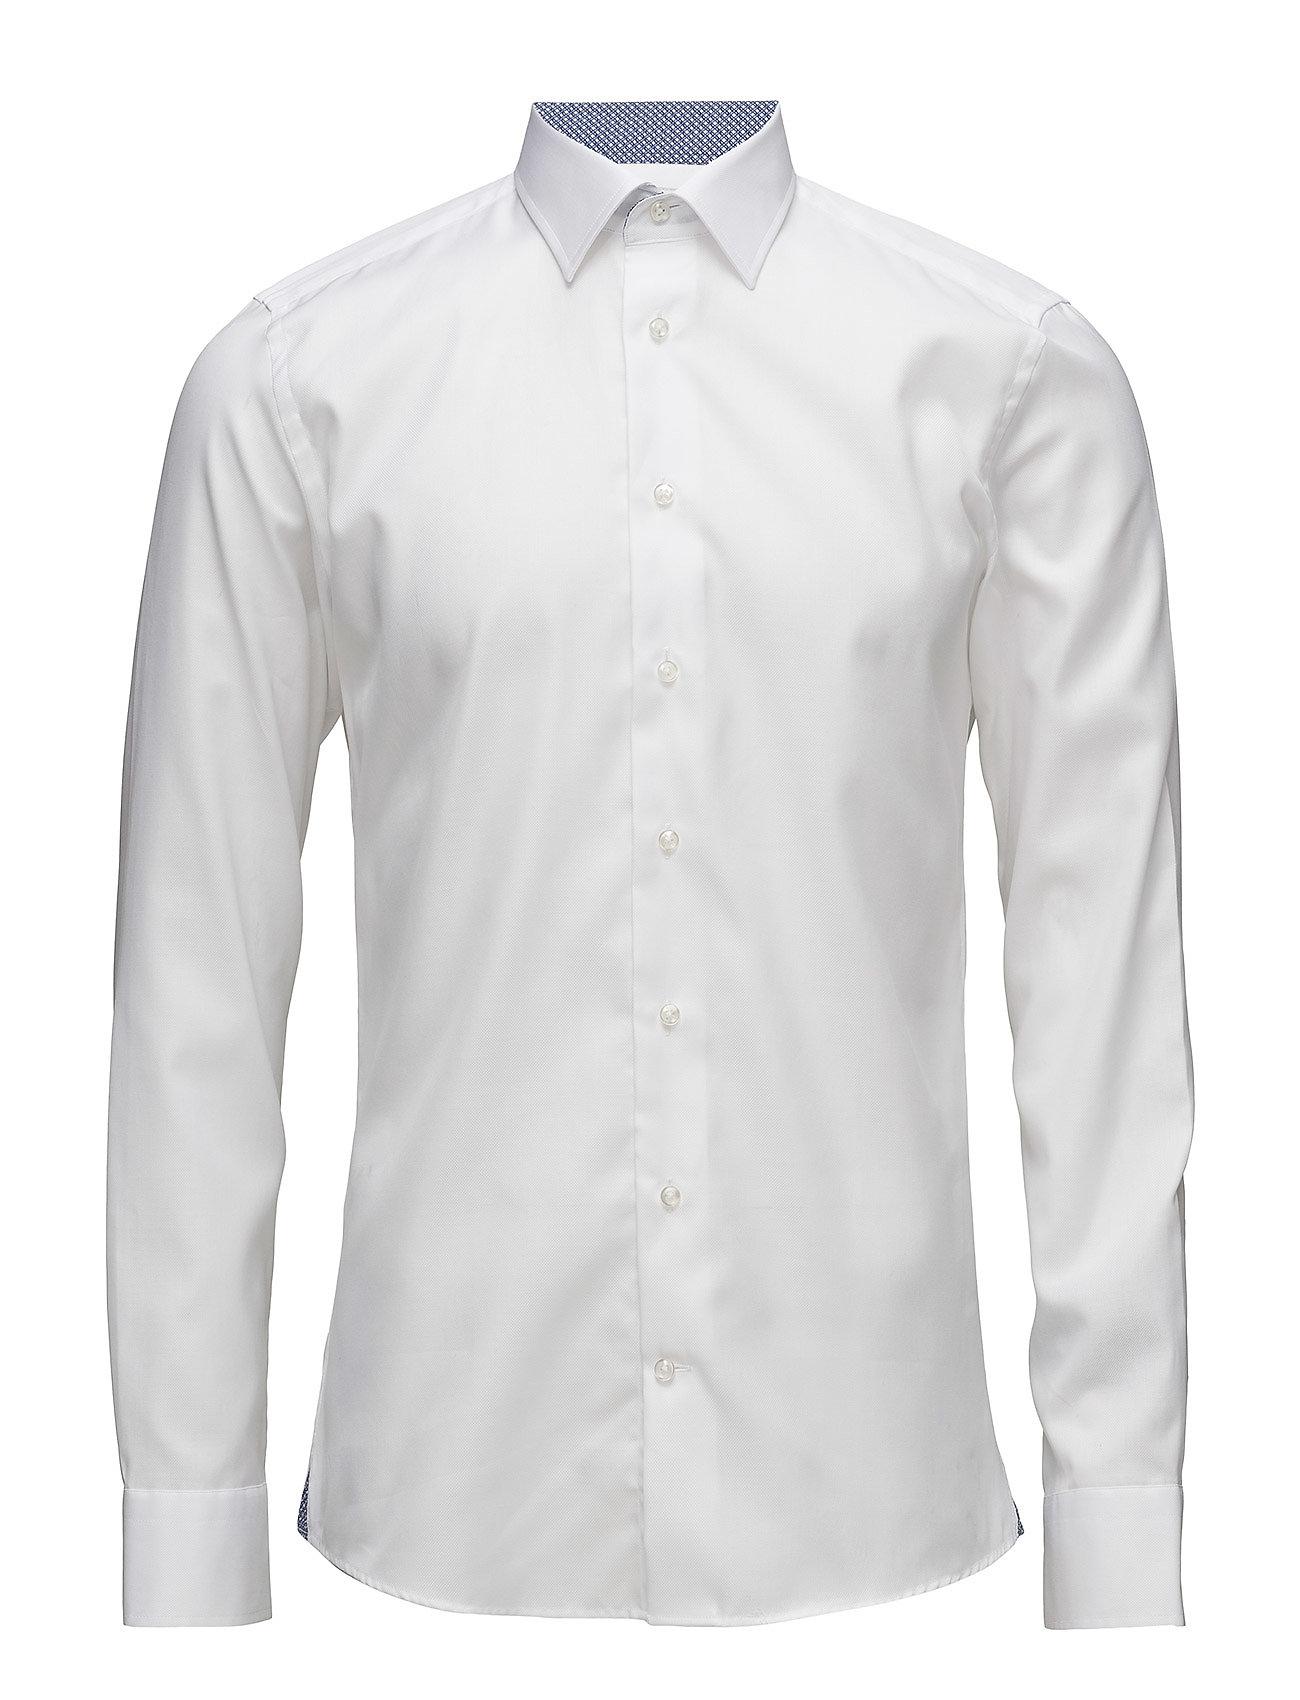 xo shirtmaker 8543 details - jake sc fra boozt.com dk